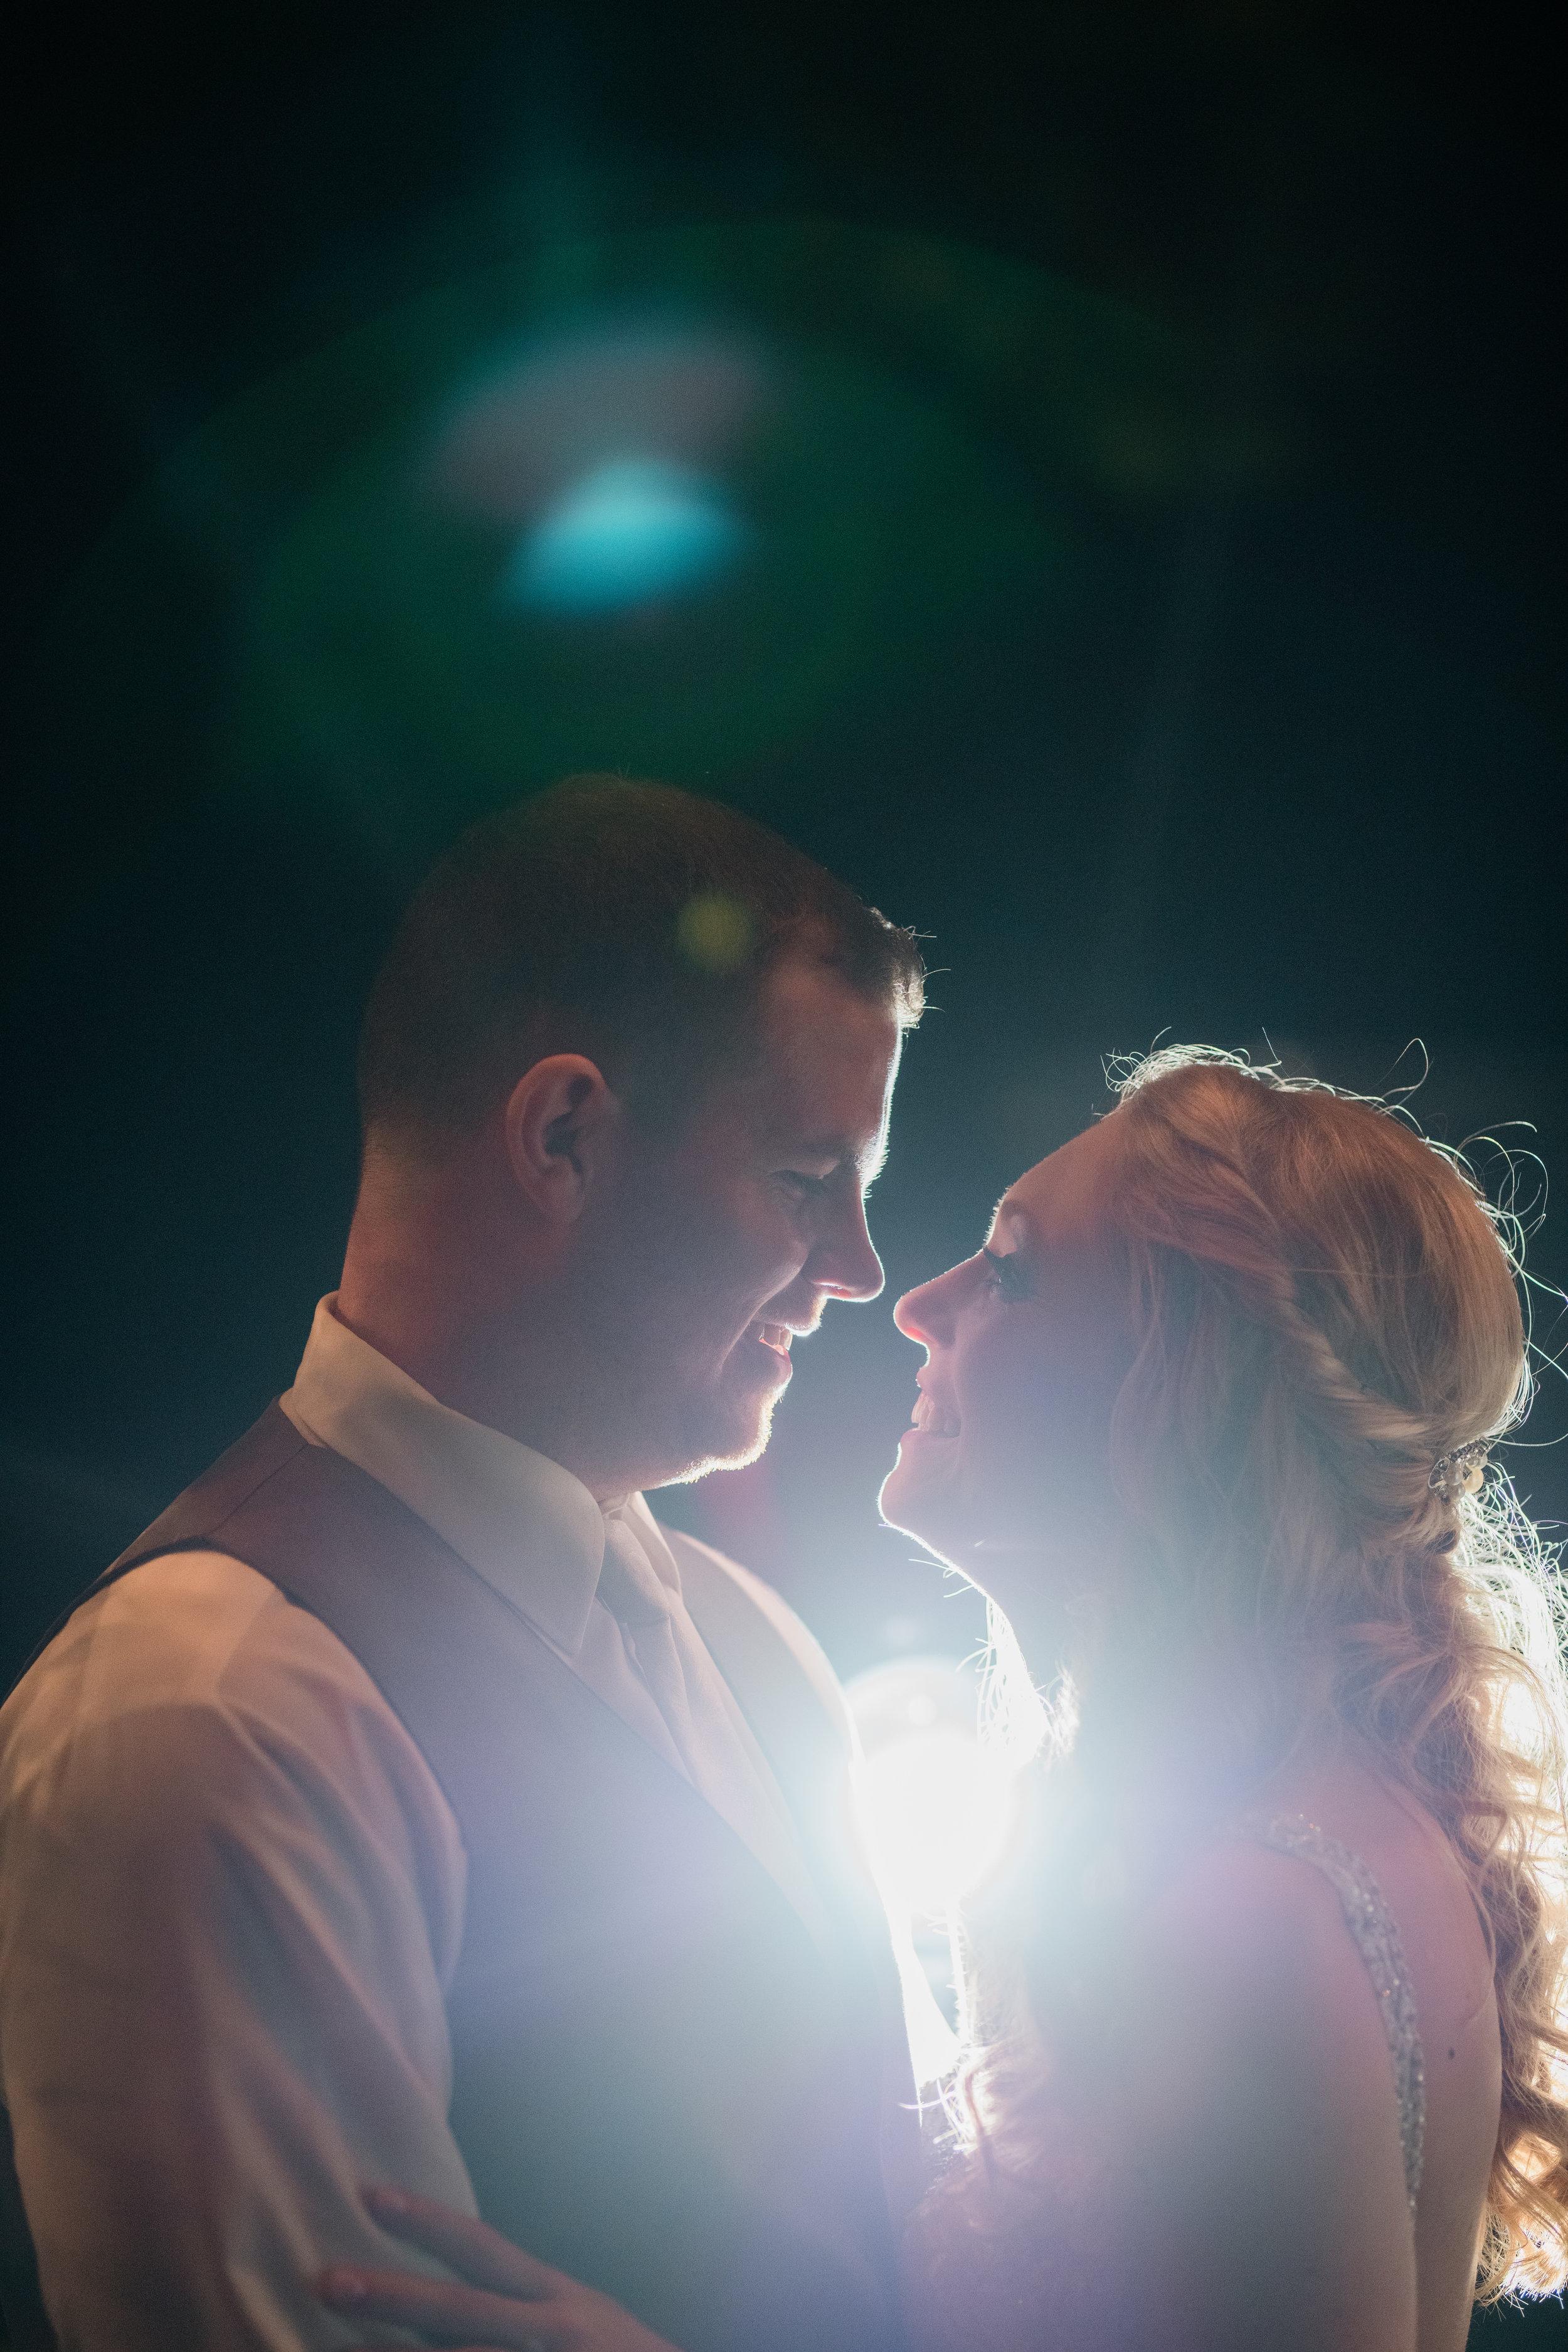 iowa-wedding-r-b-5331-2-star_iowa-wedding-r-b.jpg